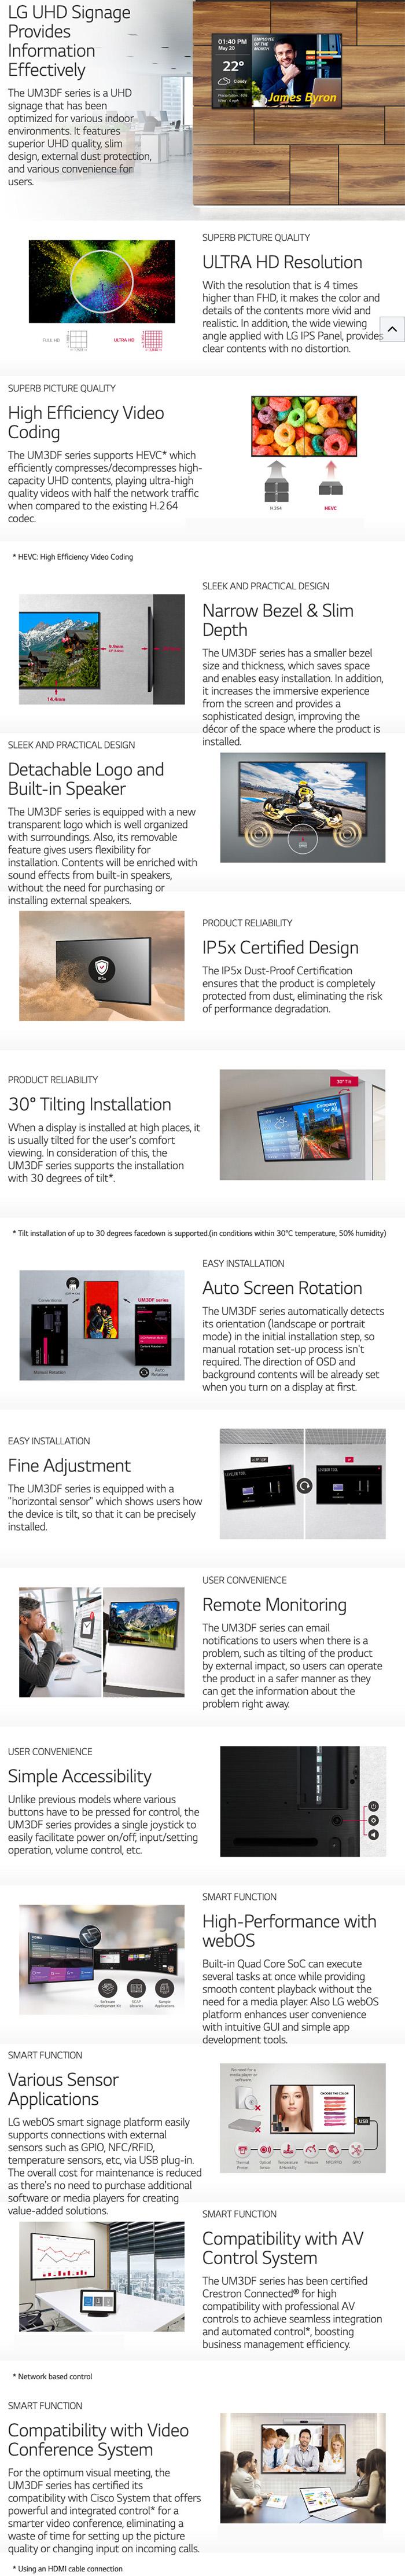 LG UM3DF Series 4K 18 7 Narrow Bezel IPS Digital Signage features